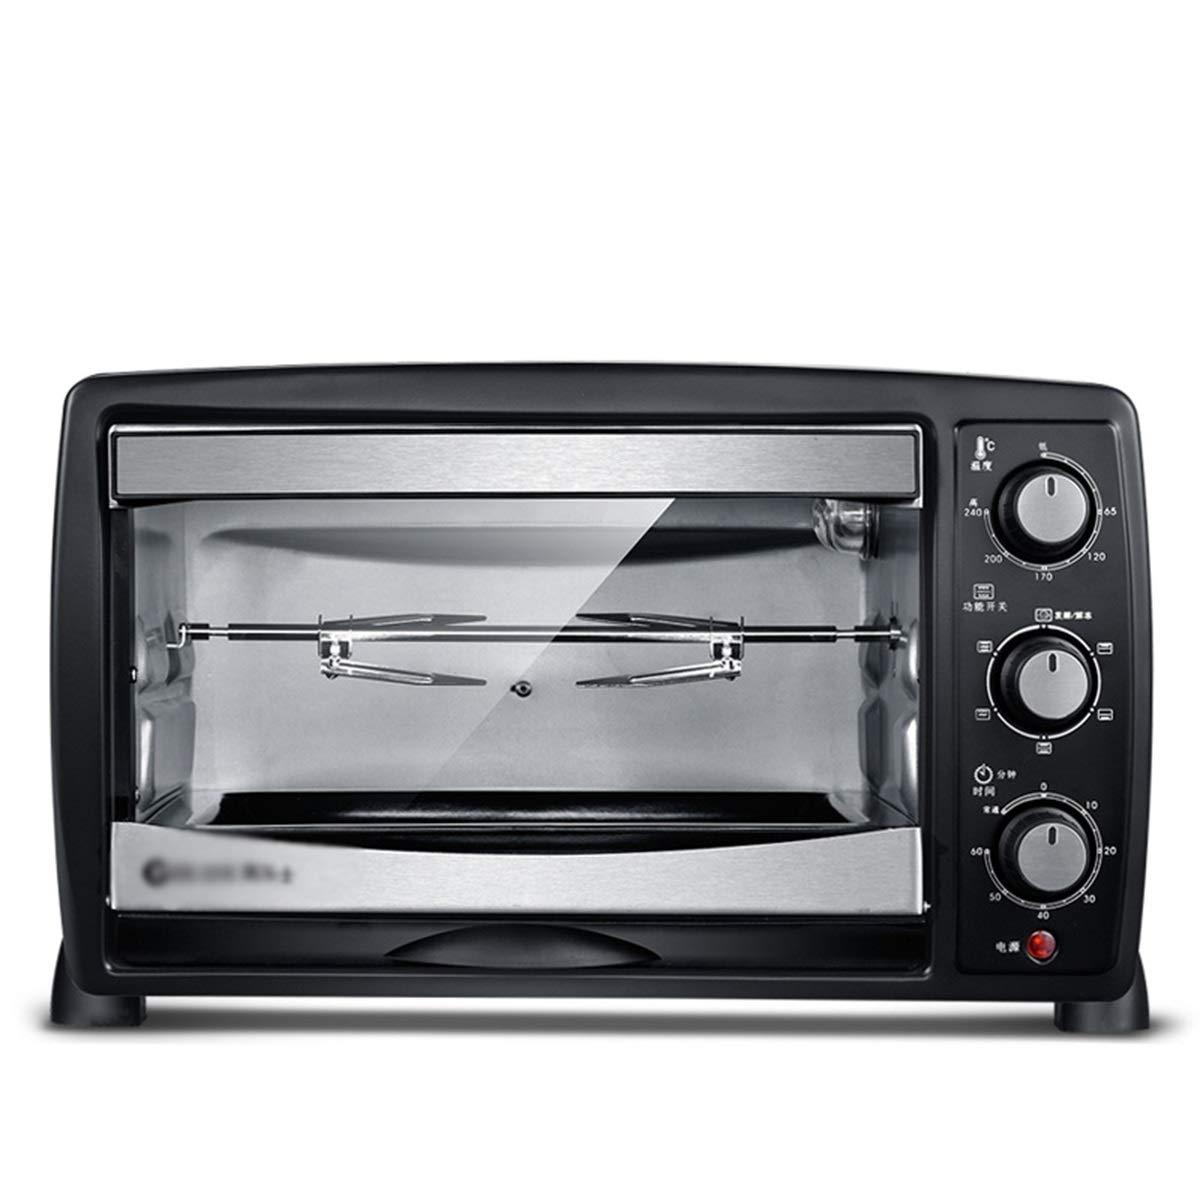 NKDK オーブン25リットル電気オーブンギフト卸売大容量家庭用ベーキング(2オーブンを含む) -38 オーブン B07RS2CS38